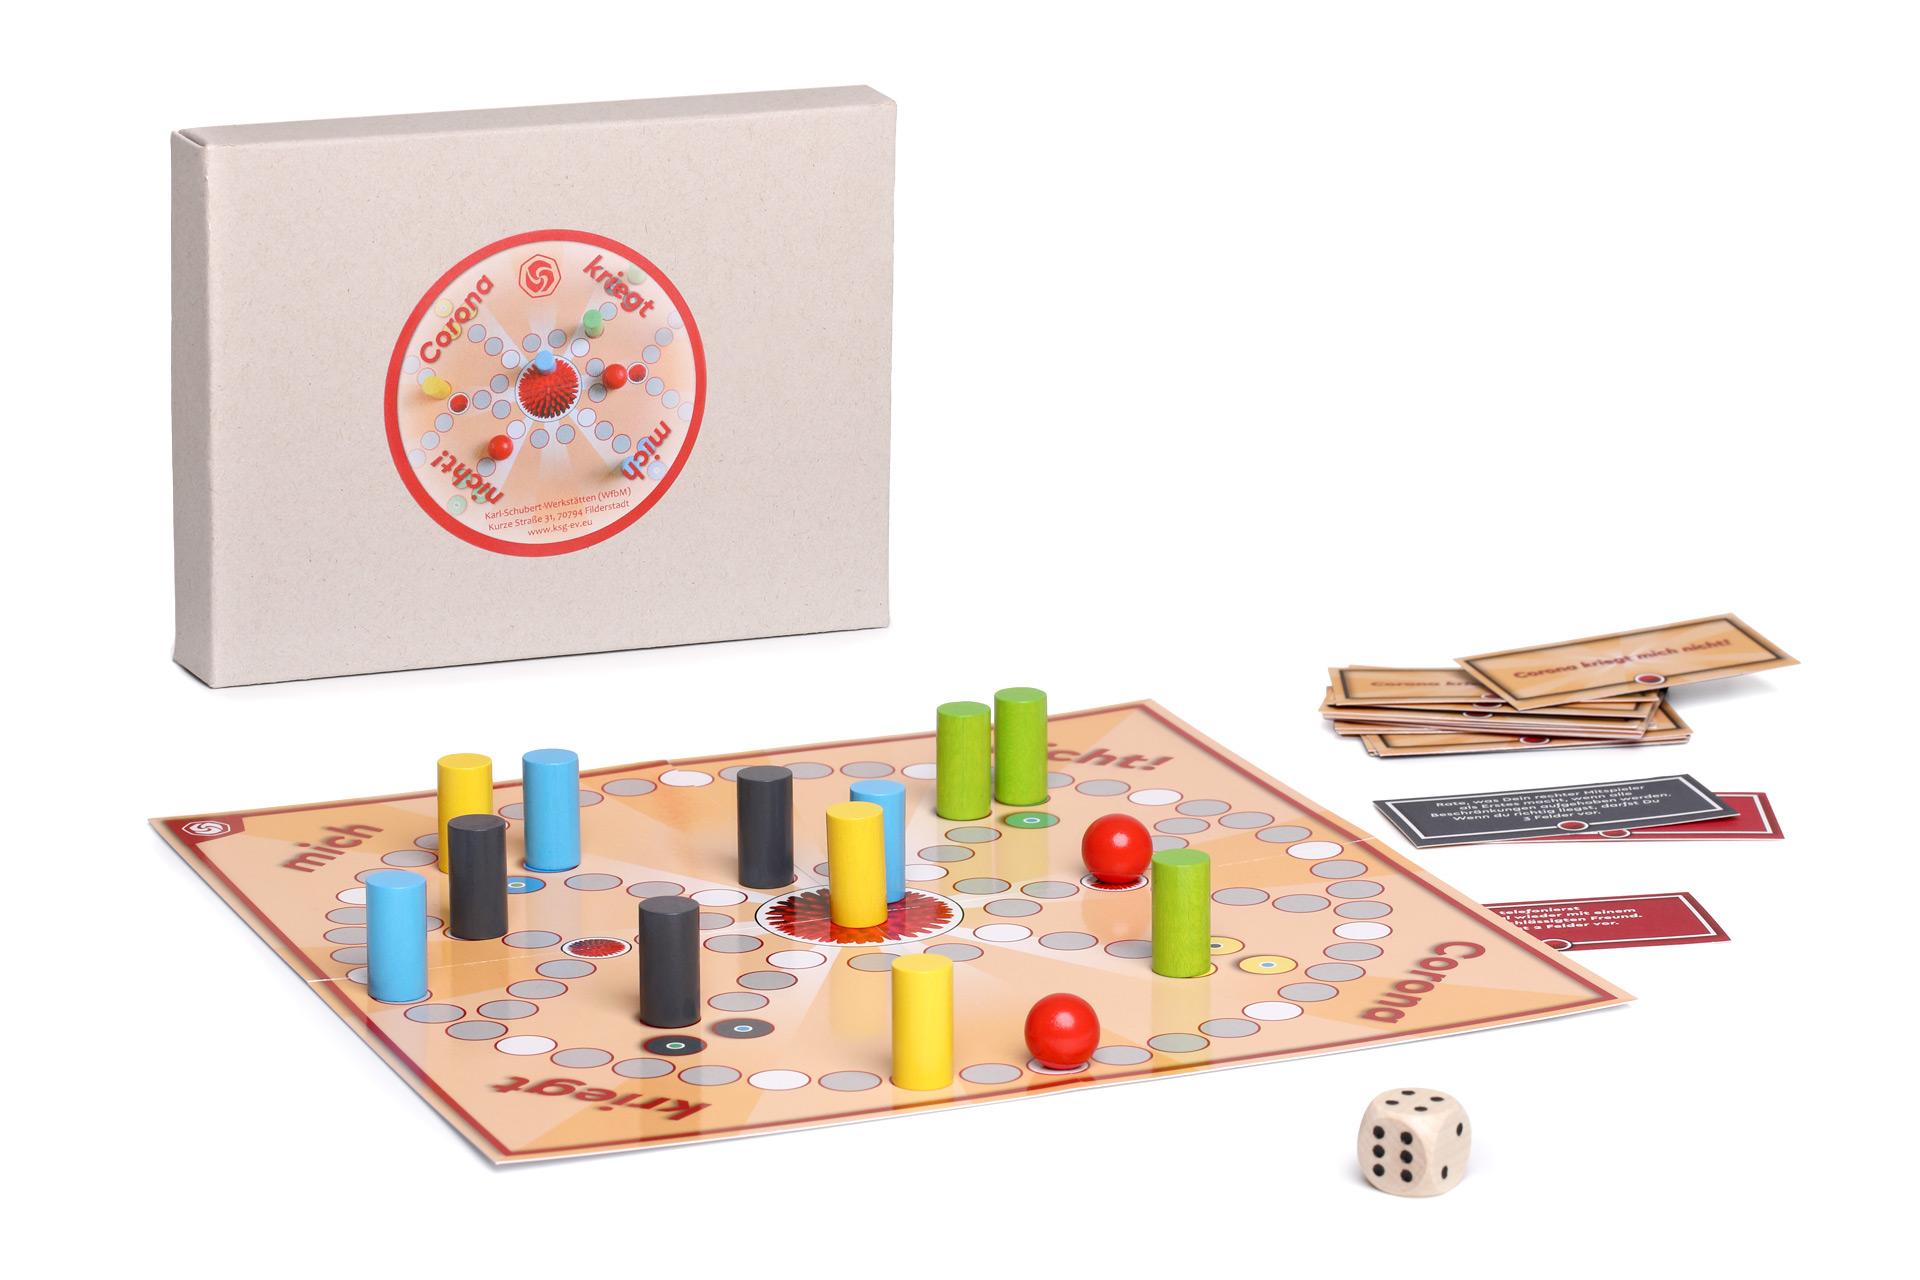 Coronaspiel-kreativ-Wuerfelspiel-ksg